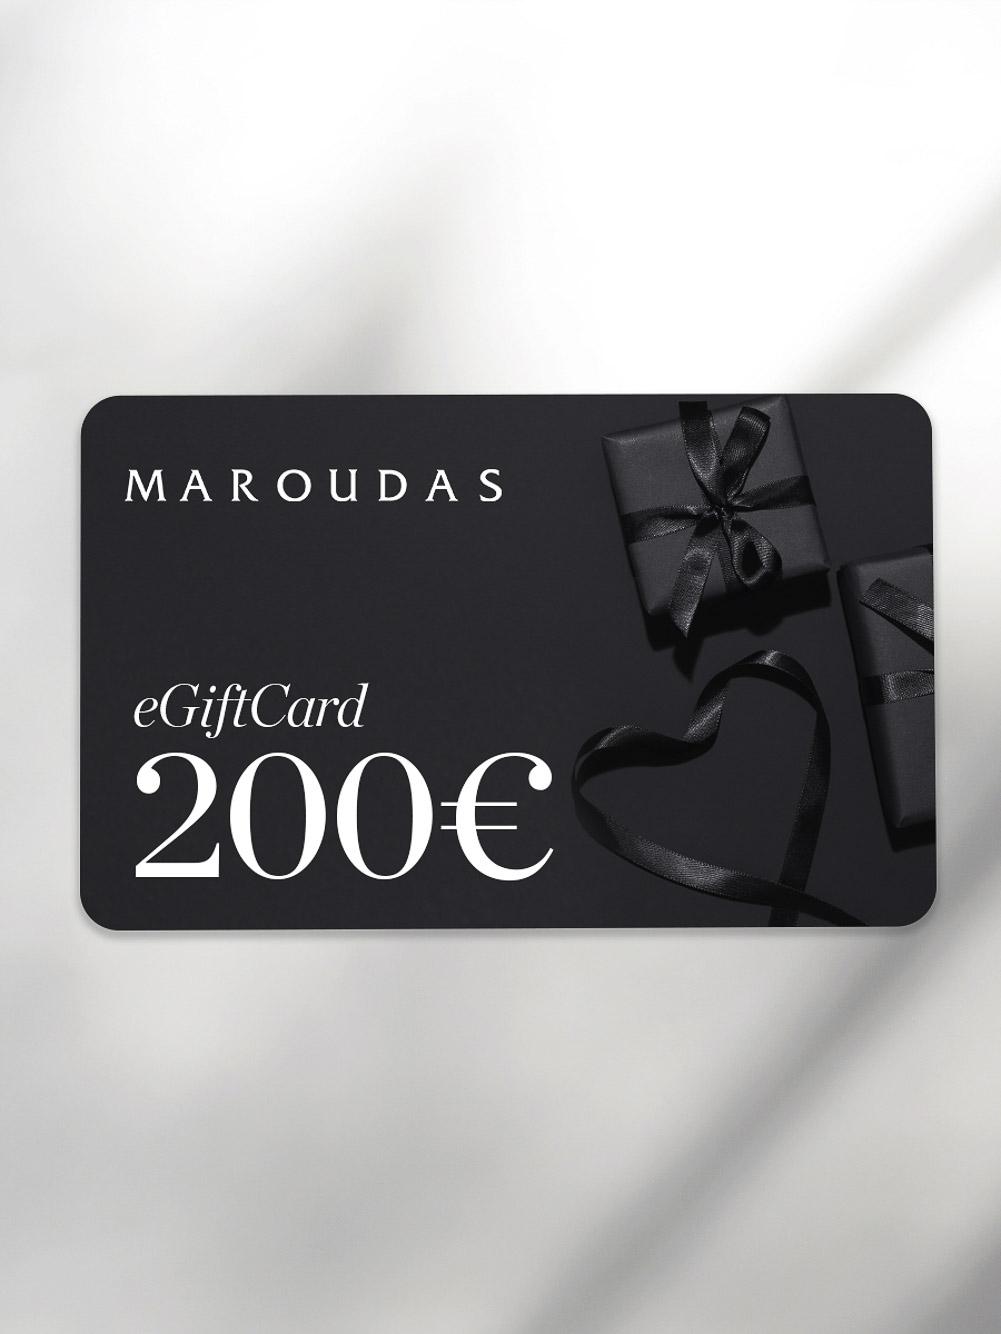 GIFT CARD GIFT CARD 200 € GIFT CARD GIFT